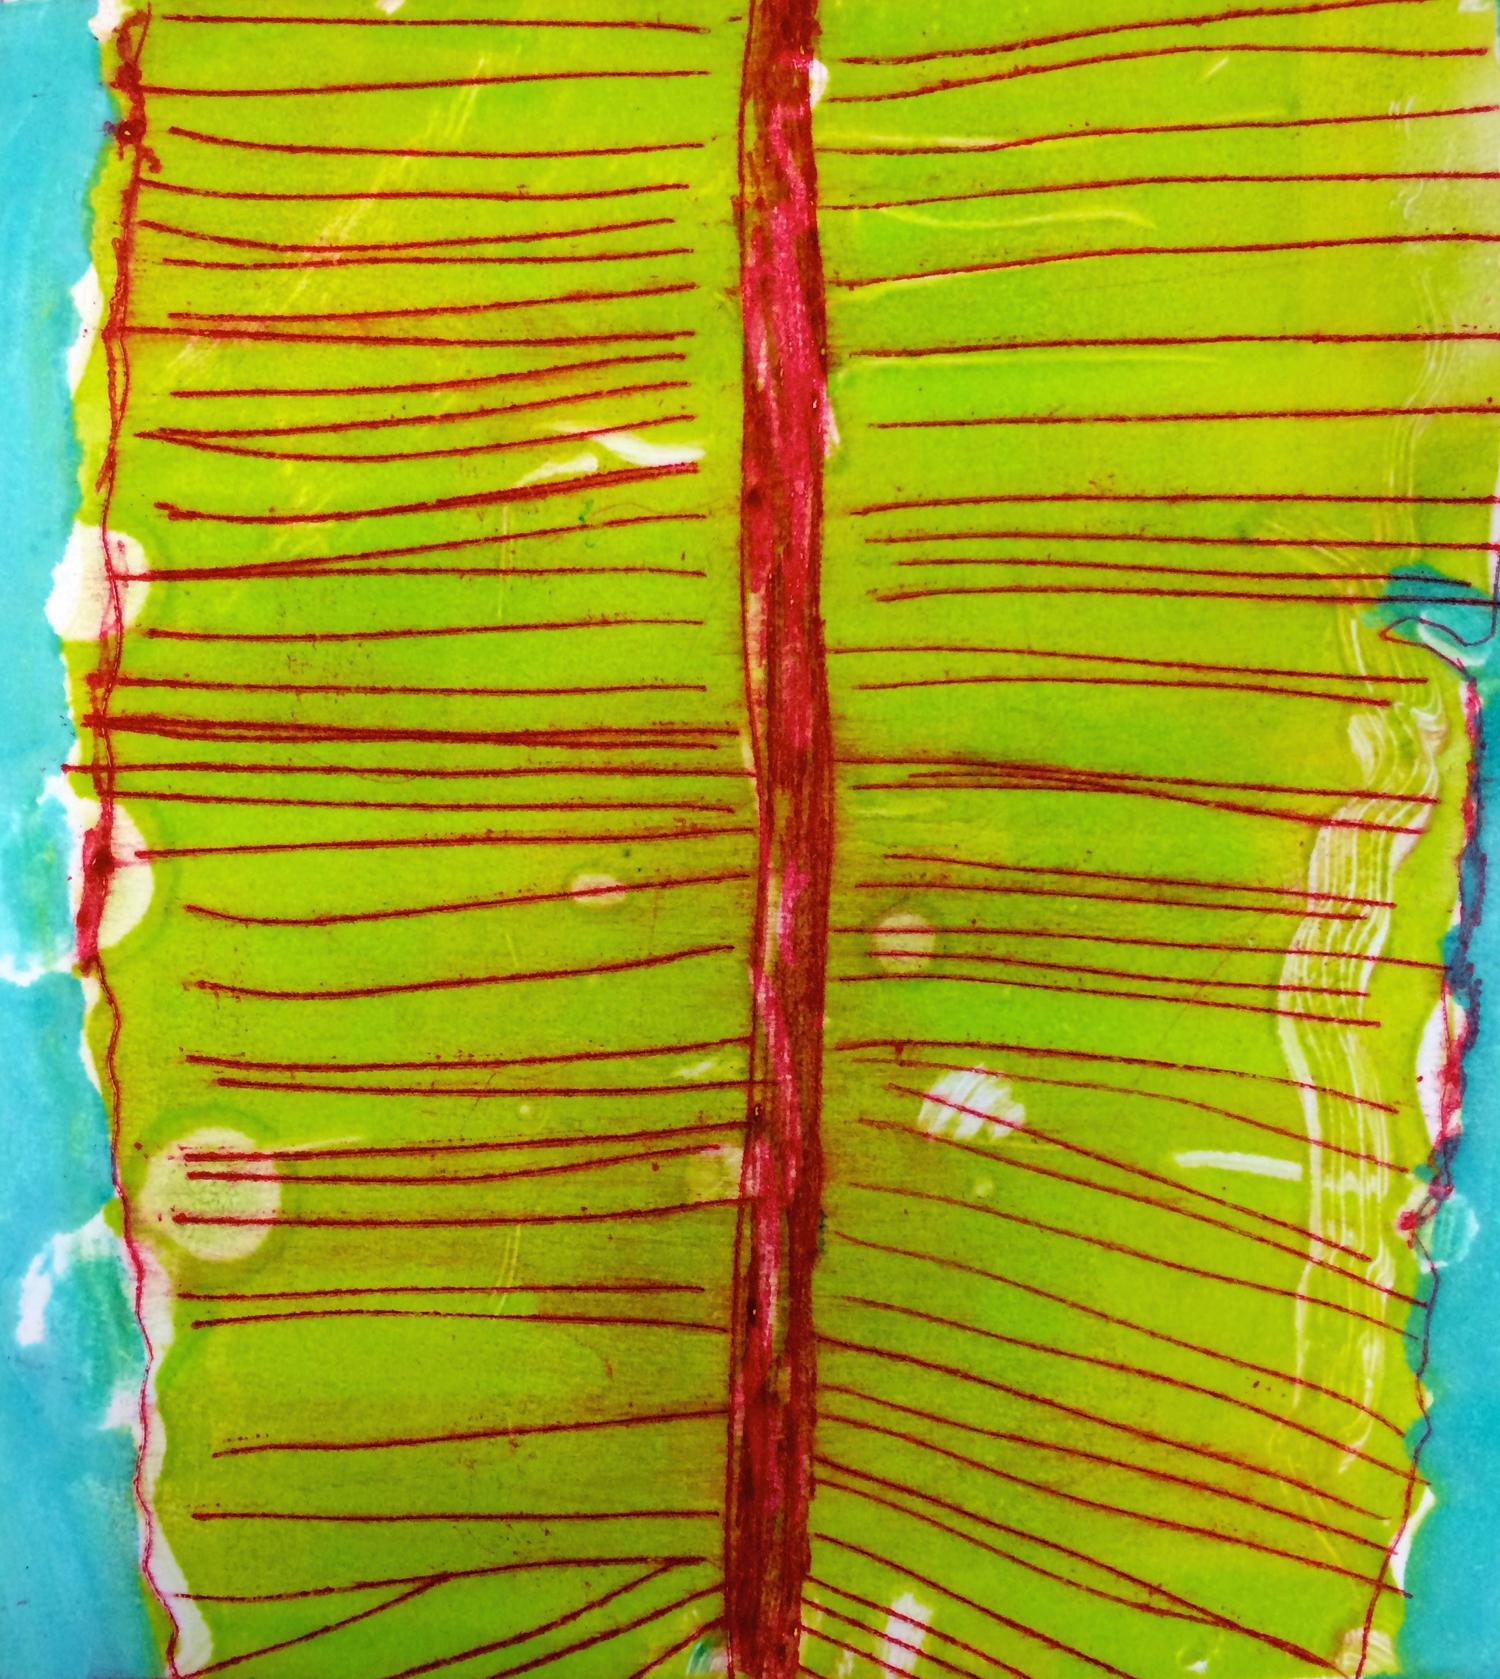 Frond  - Drypoint/monotype, 12x8, 2016